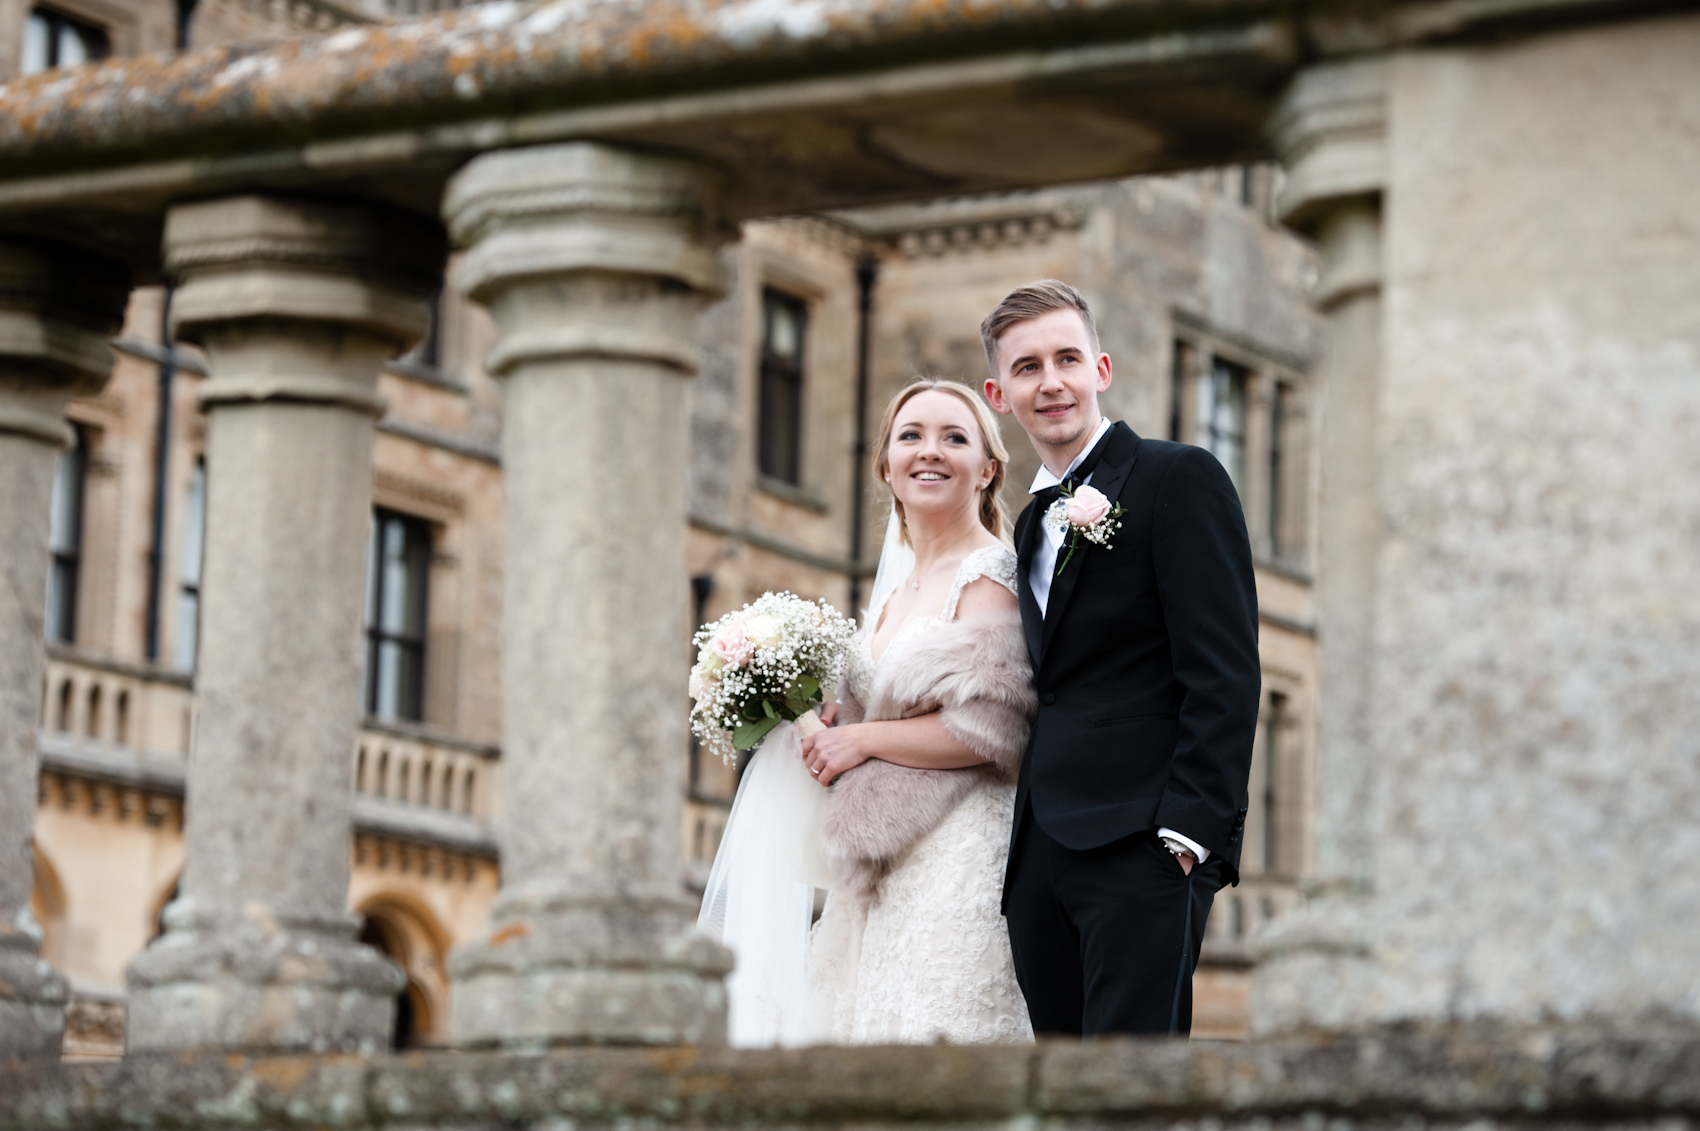 Declan & Emma wedding (15 of 29).jpg